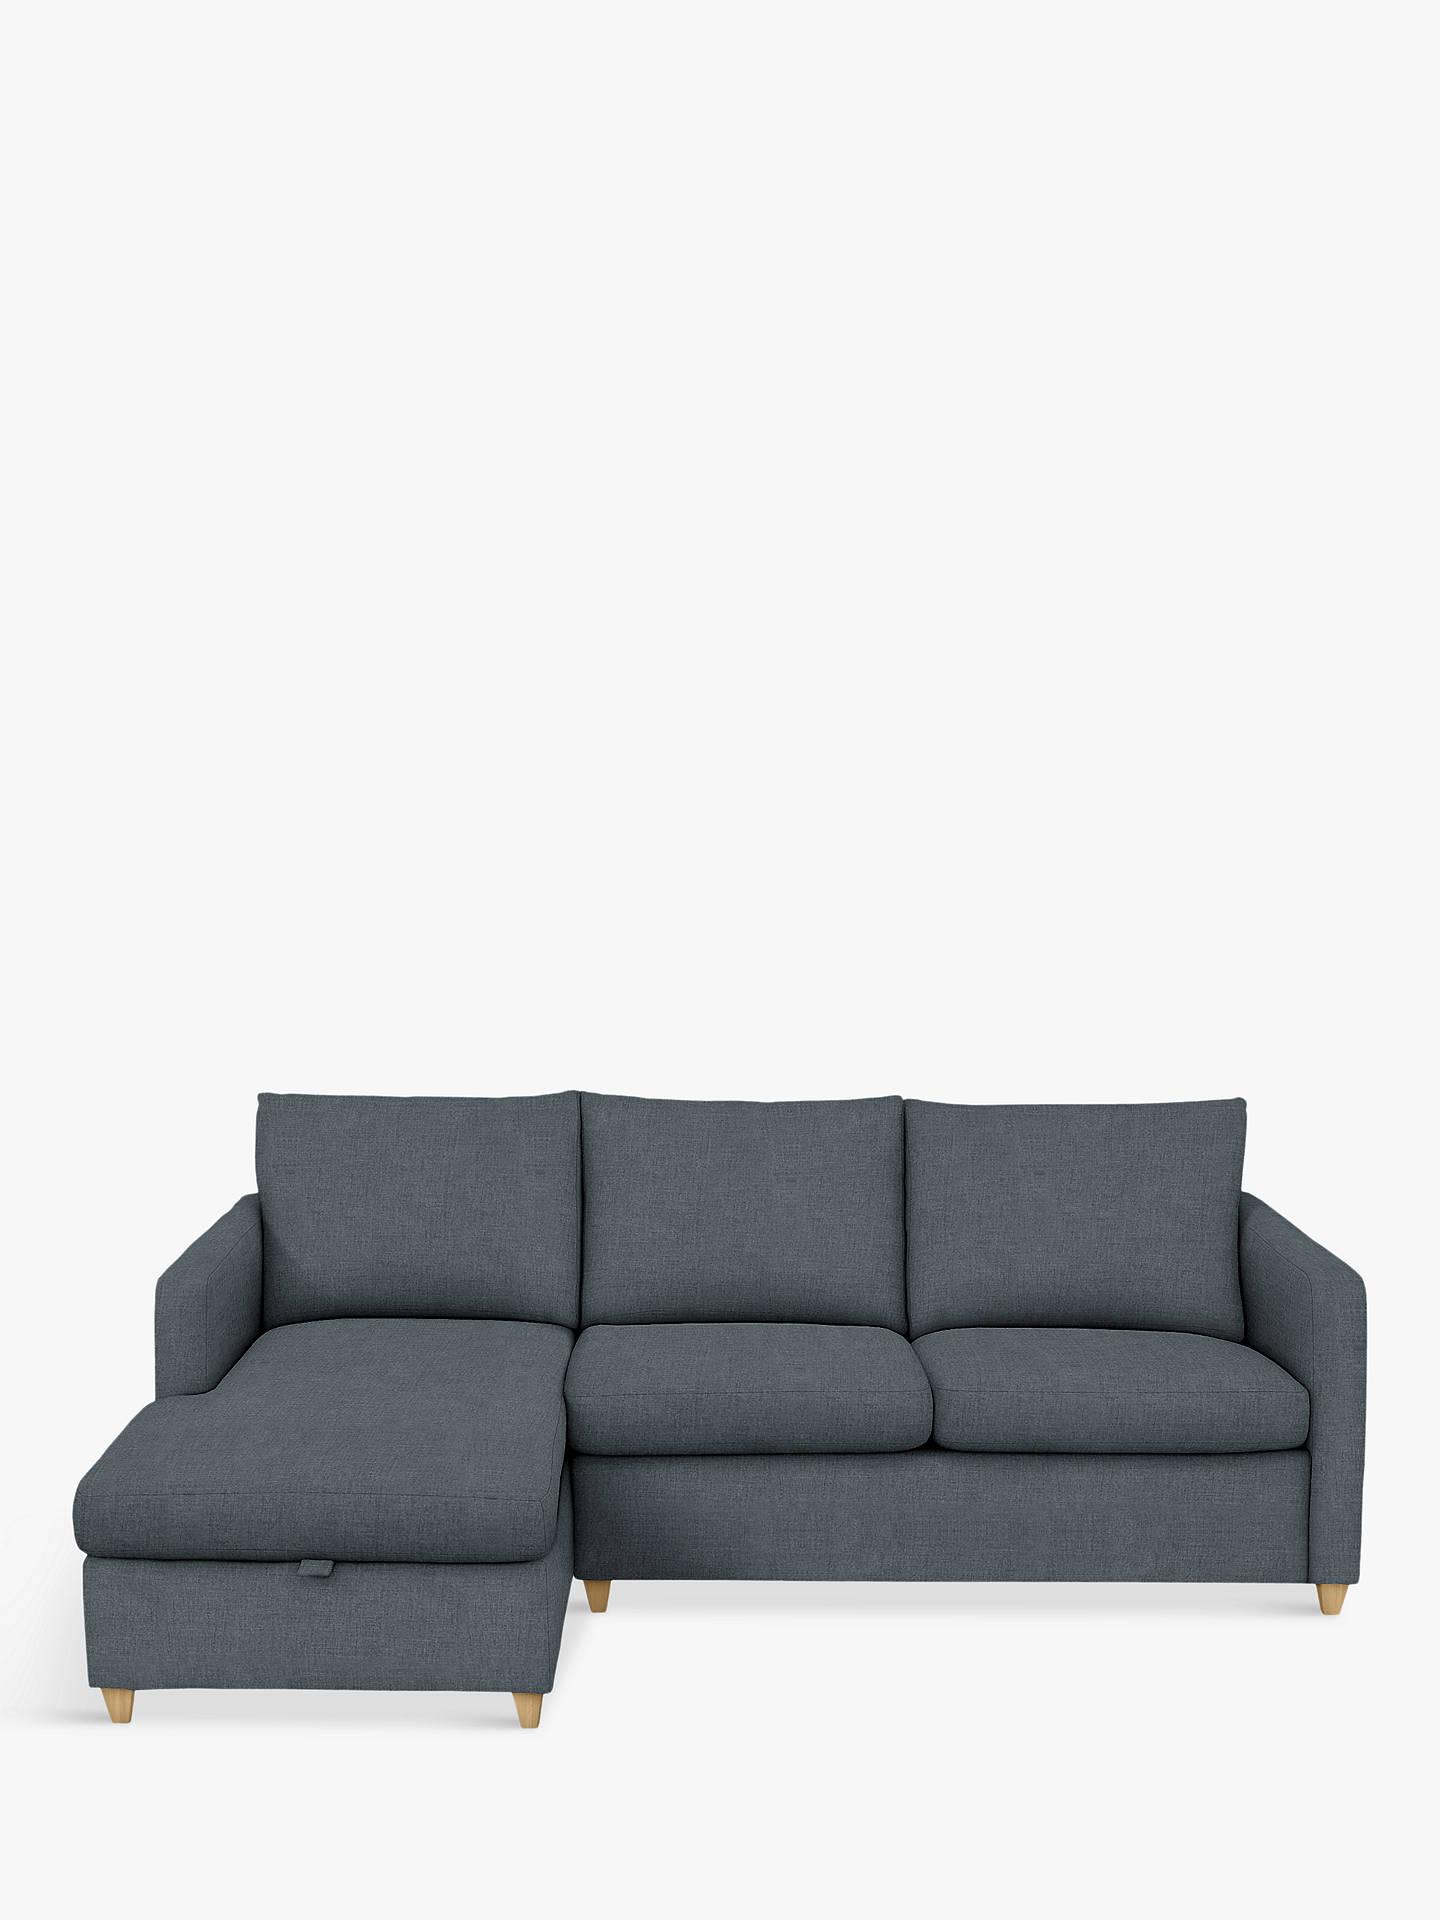 Swell John Lewis Partners Bailey Lhf Chaise End Sofa Bed Light Leg Hatton Steel Cjindustries Chair Design For Home Cjindustriesco